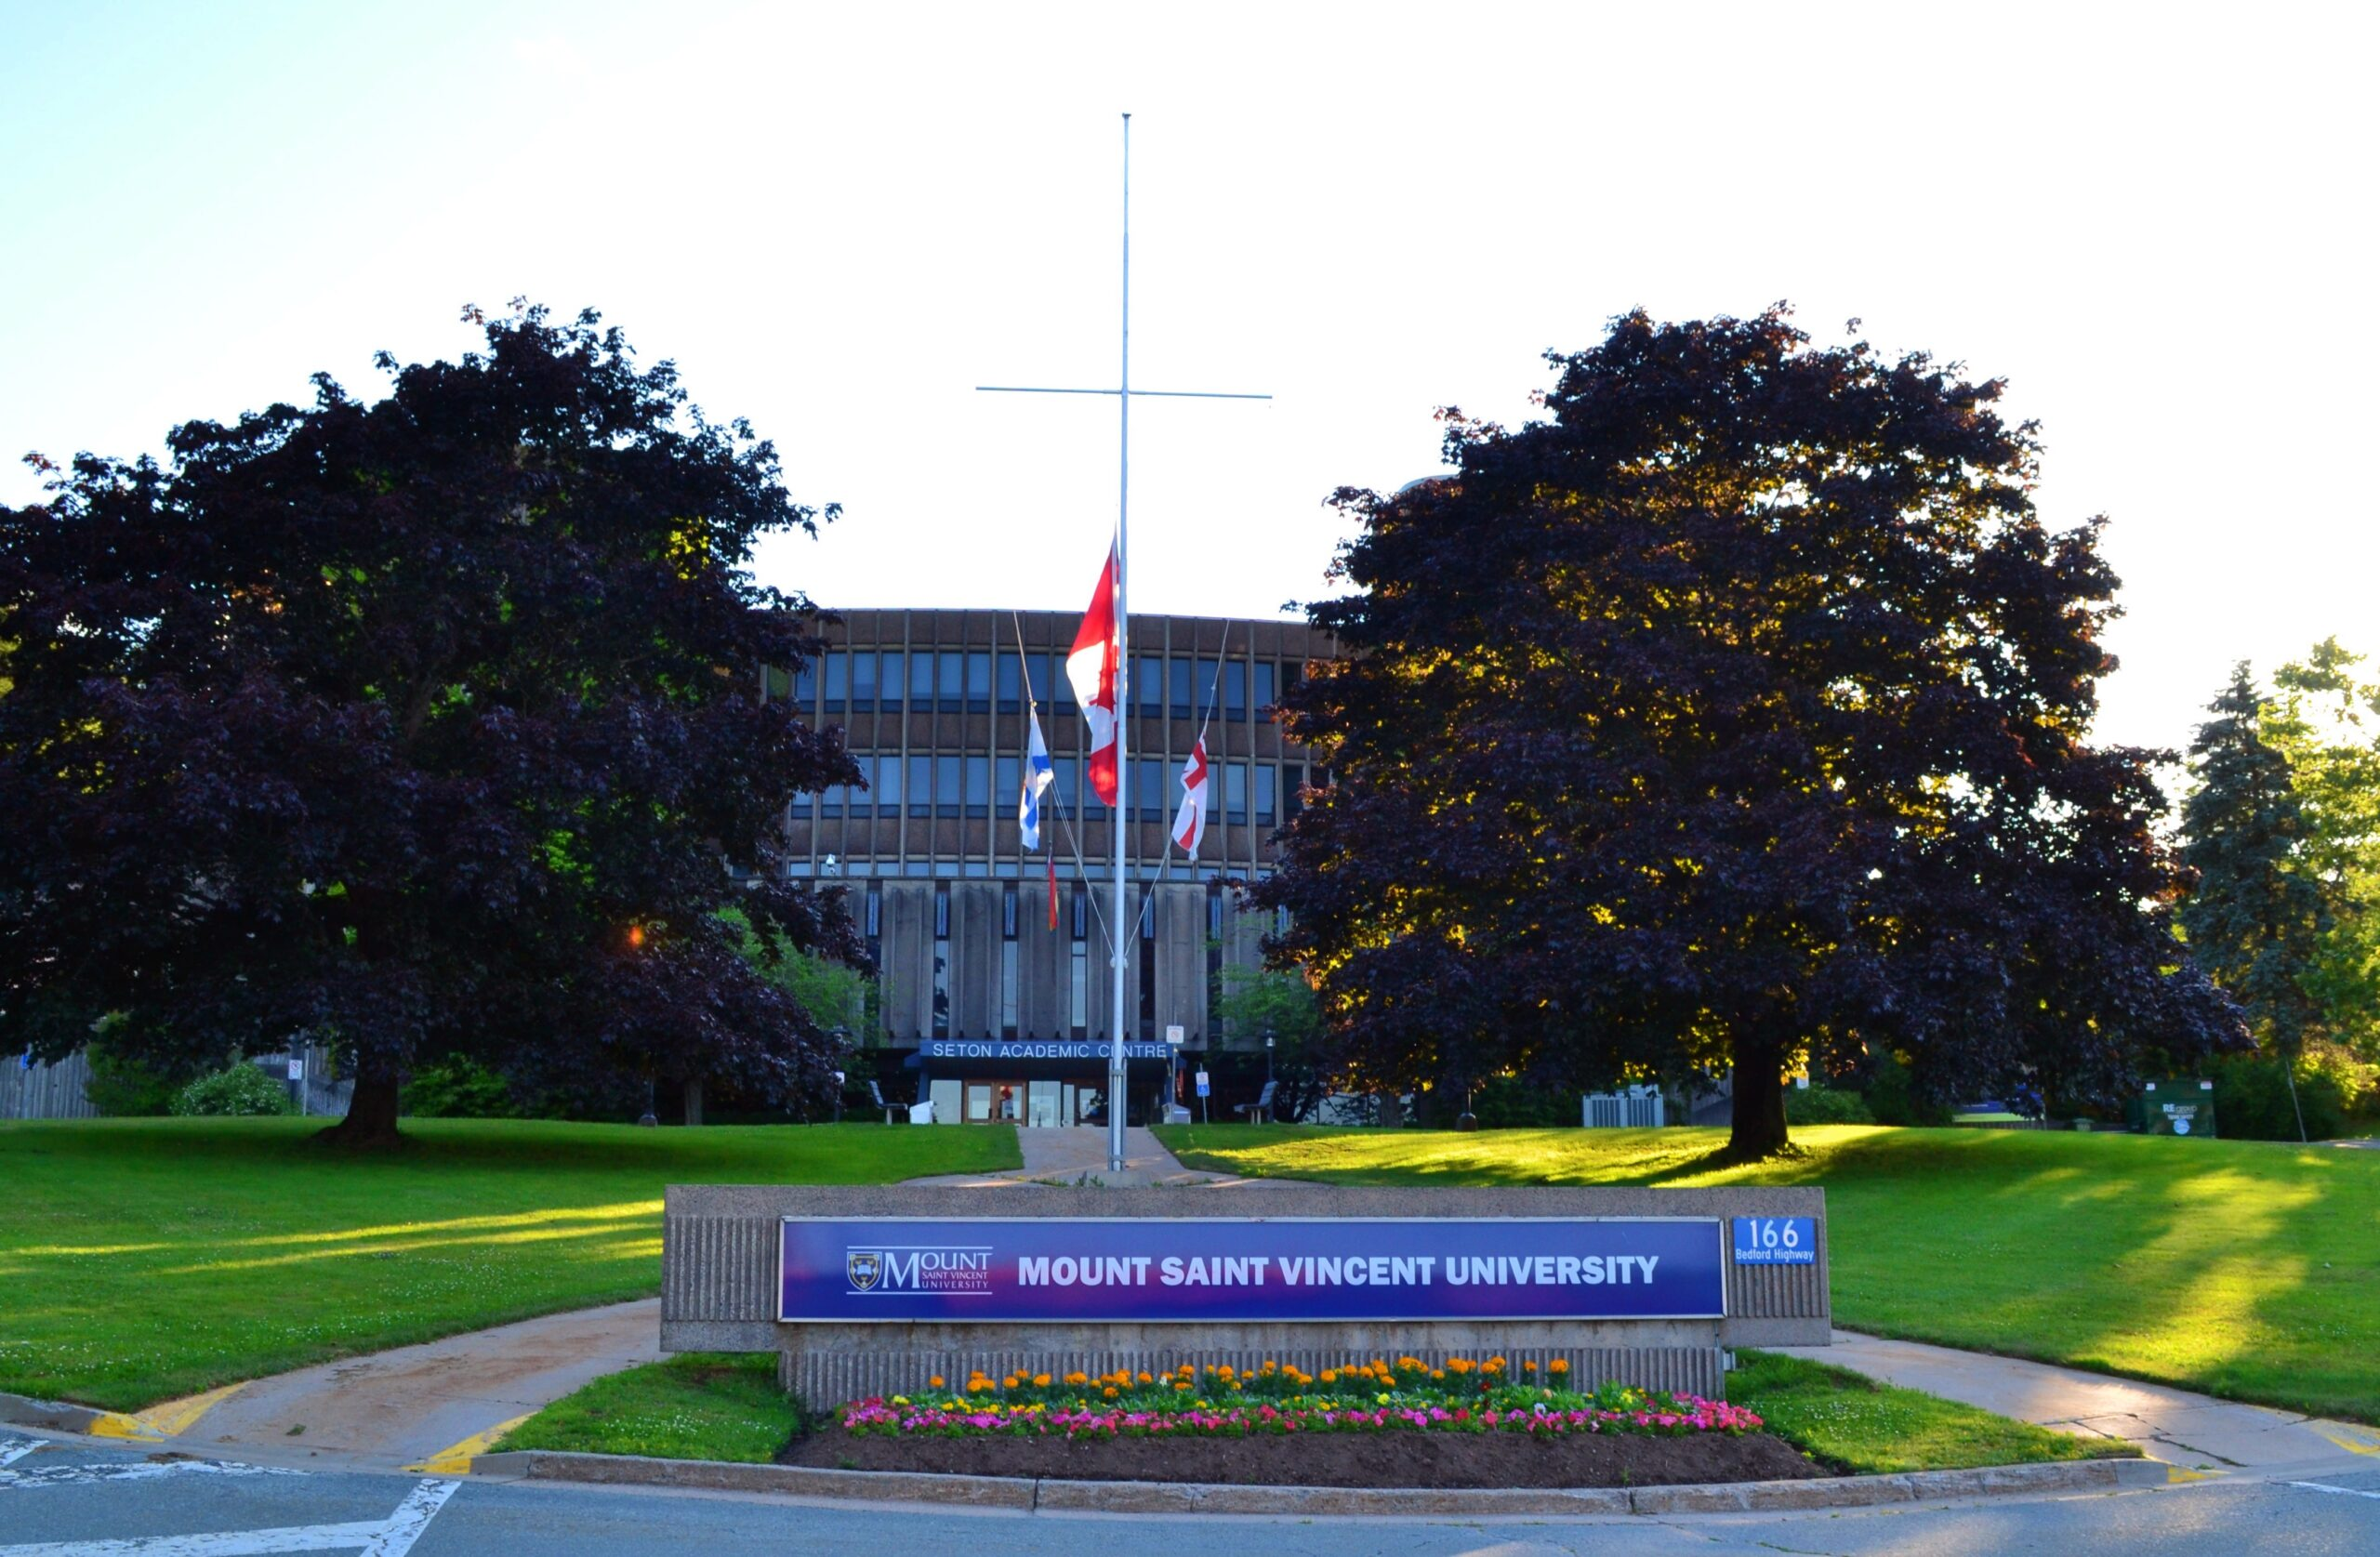 The Mount Saint Vincent University sign in front of the university's Seton Academic Building.